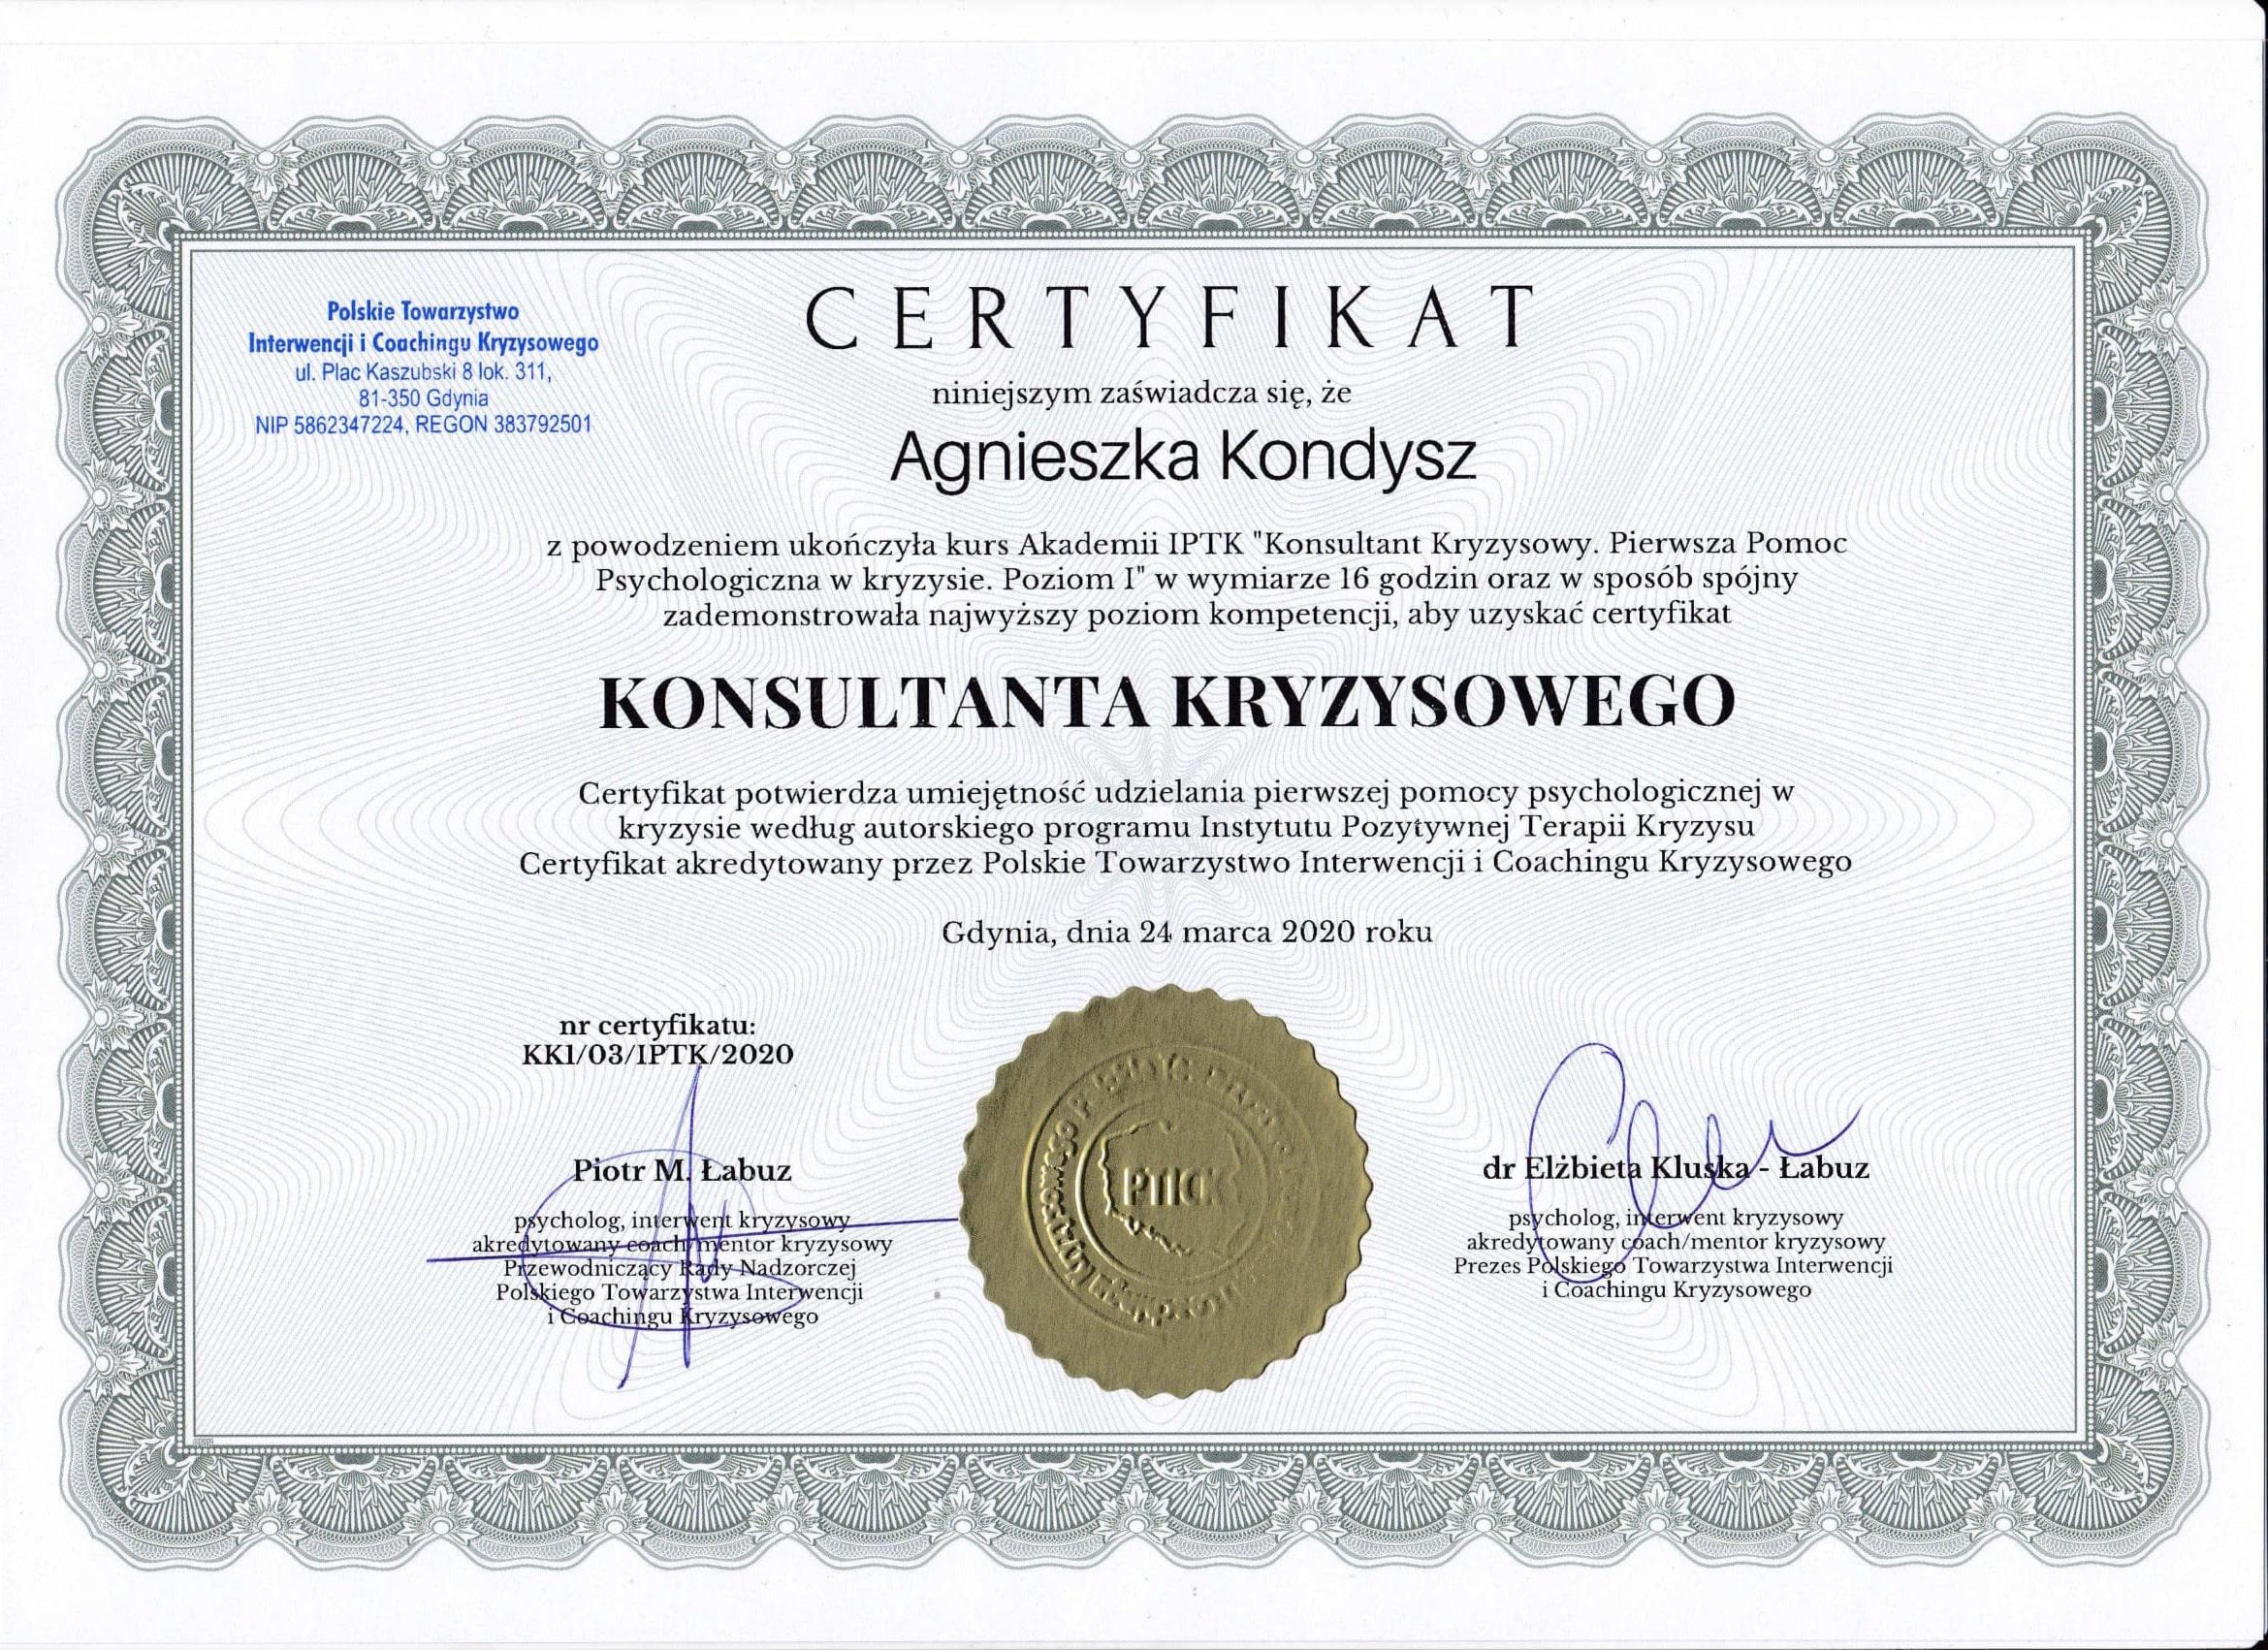 2_certyfikat-1-min